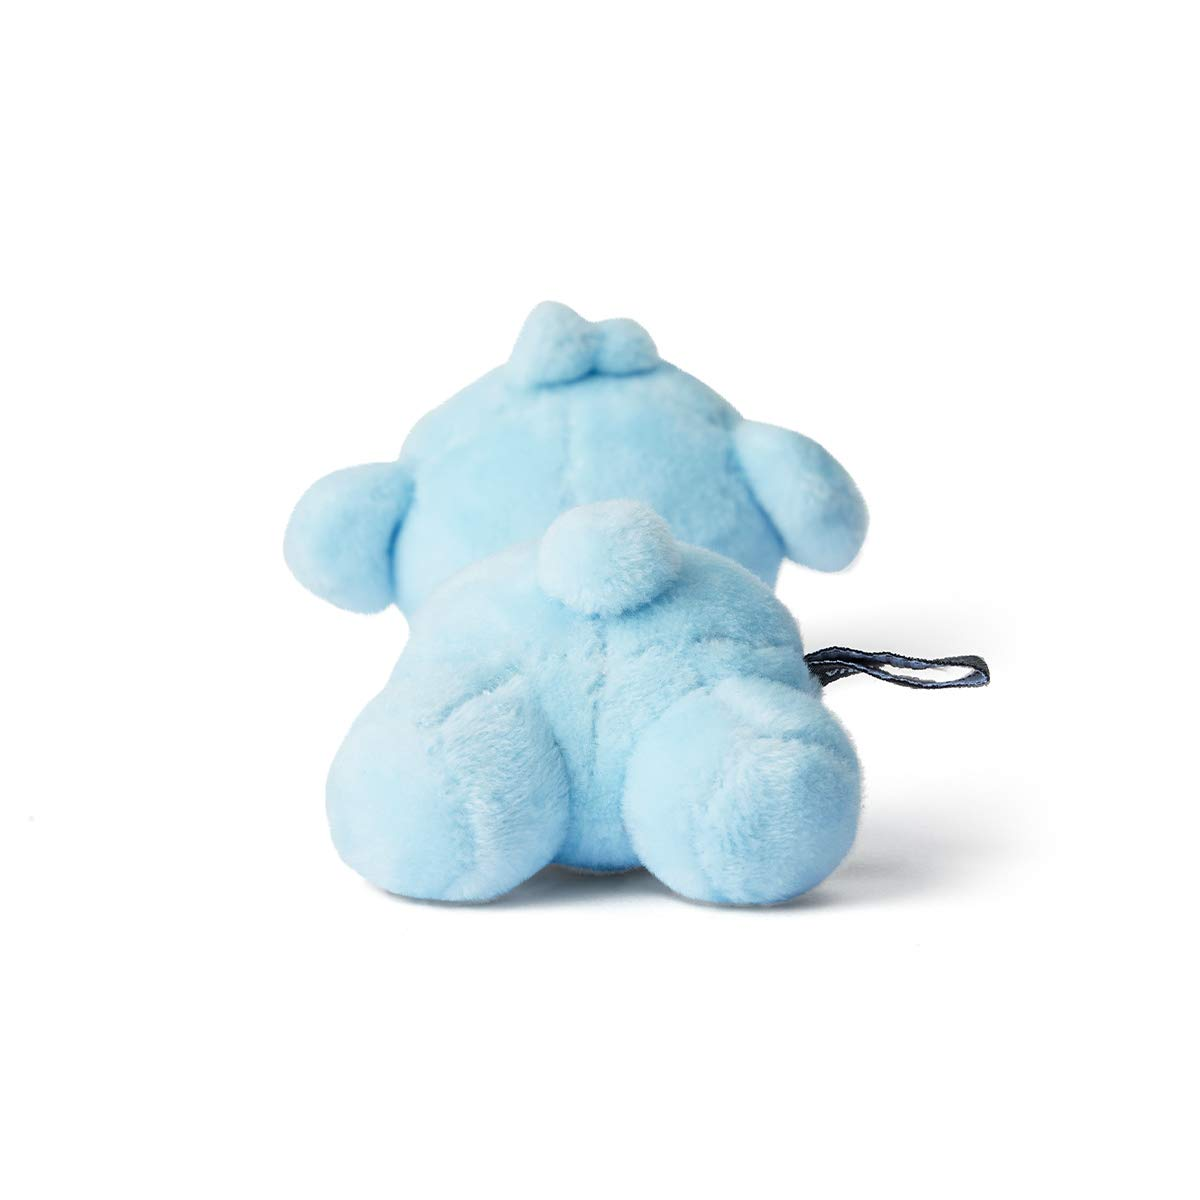 Baby Series SHOOKY Character Plush Figure Elastics Hair Tie Brown BT21 Official Merchandise by Line Friends